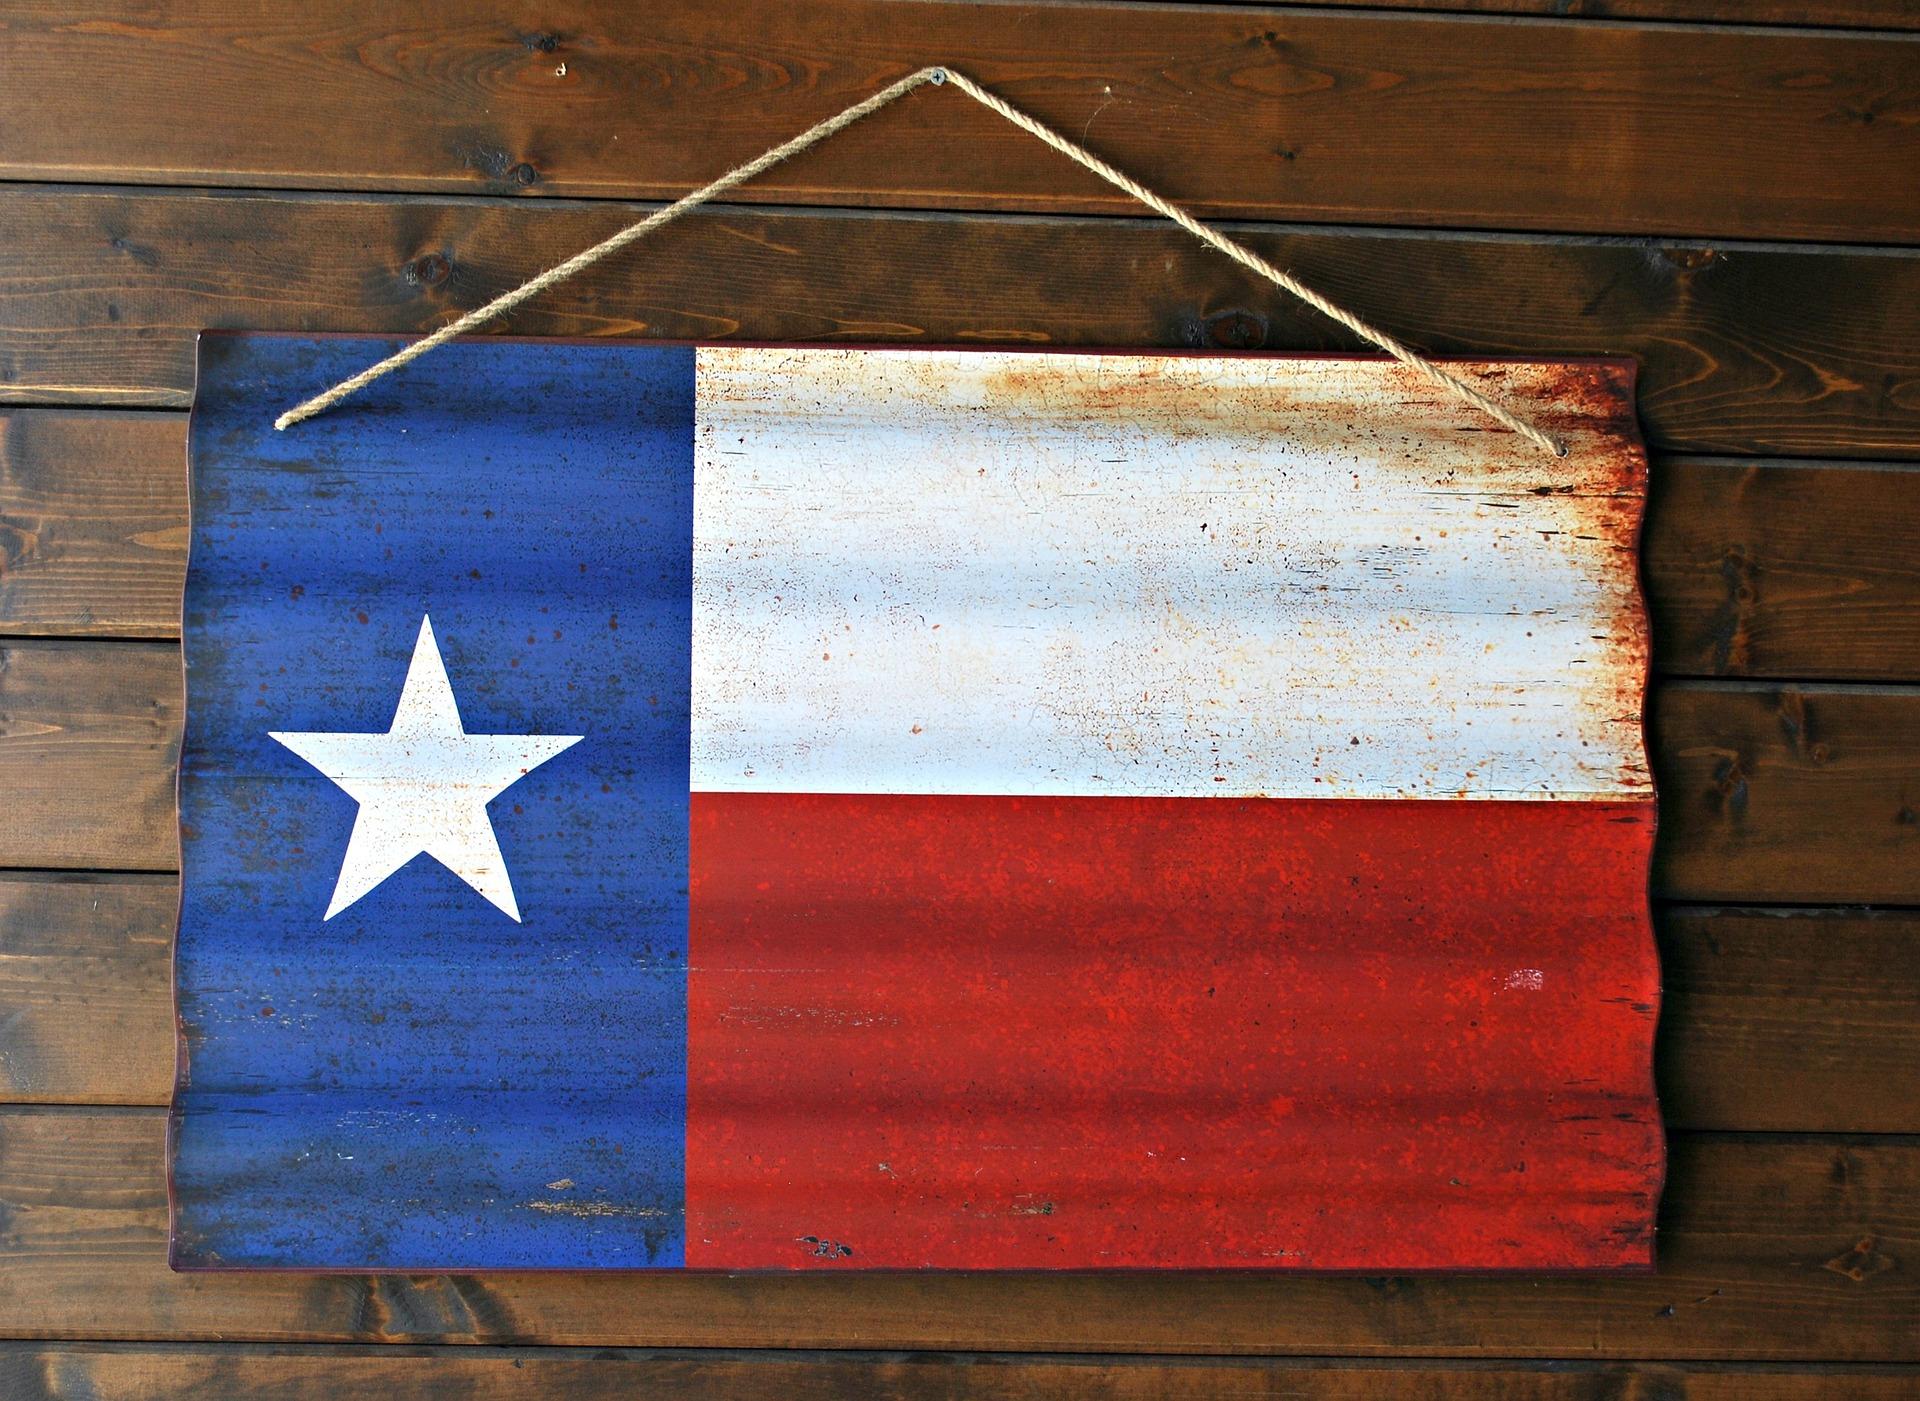 residential construction consultant Austin, TX